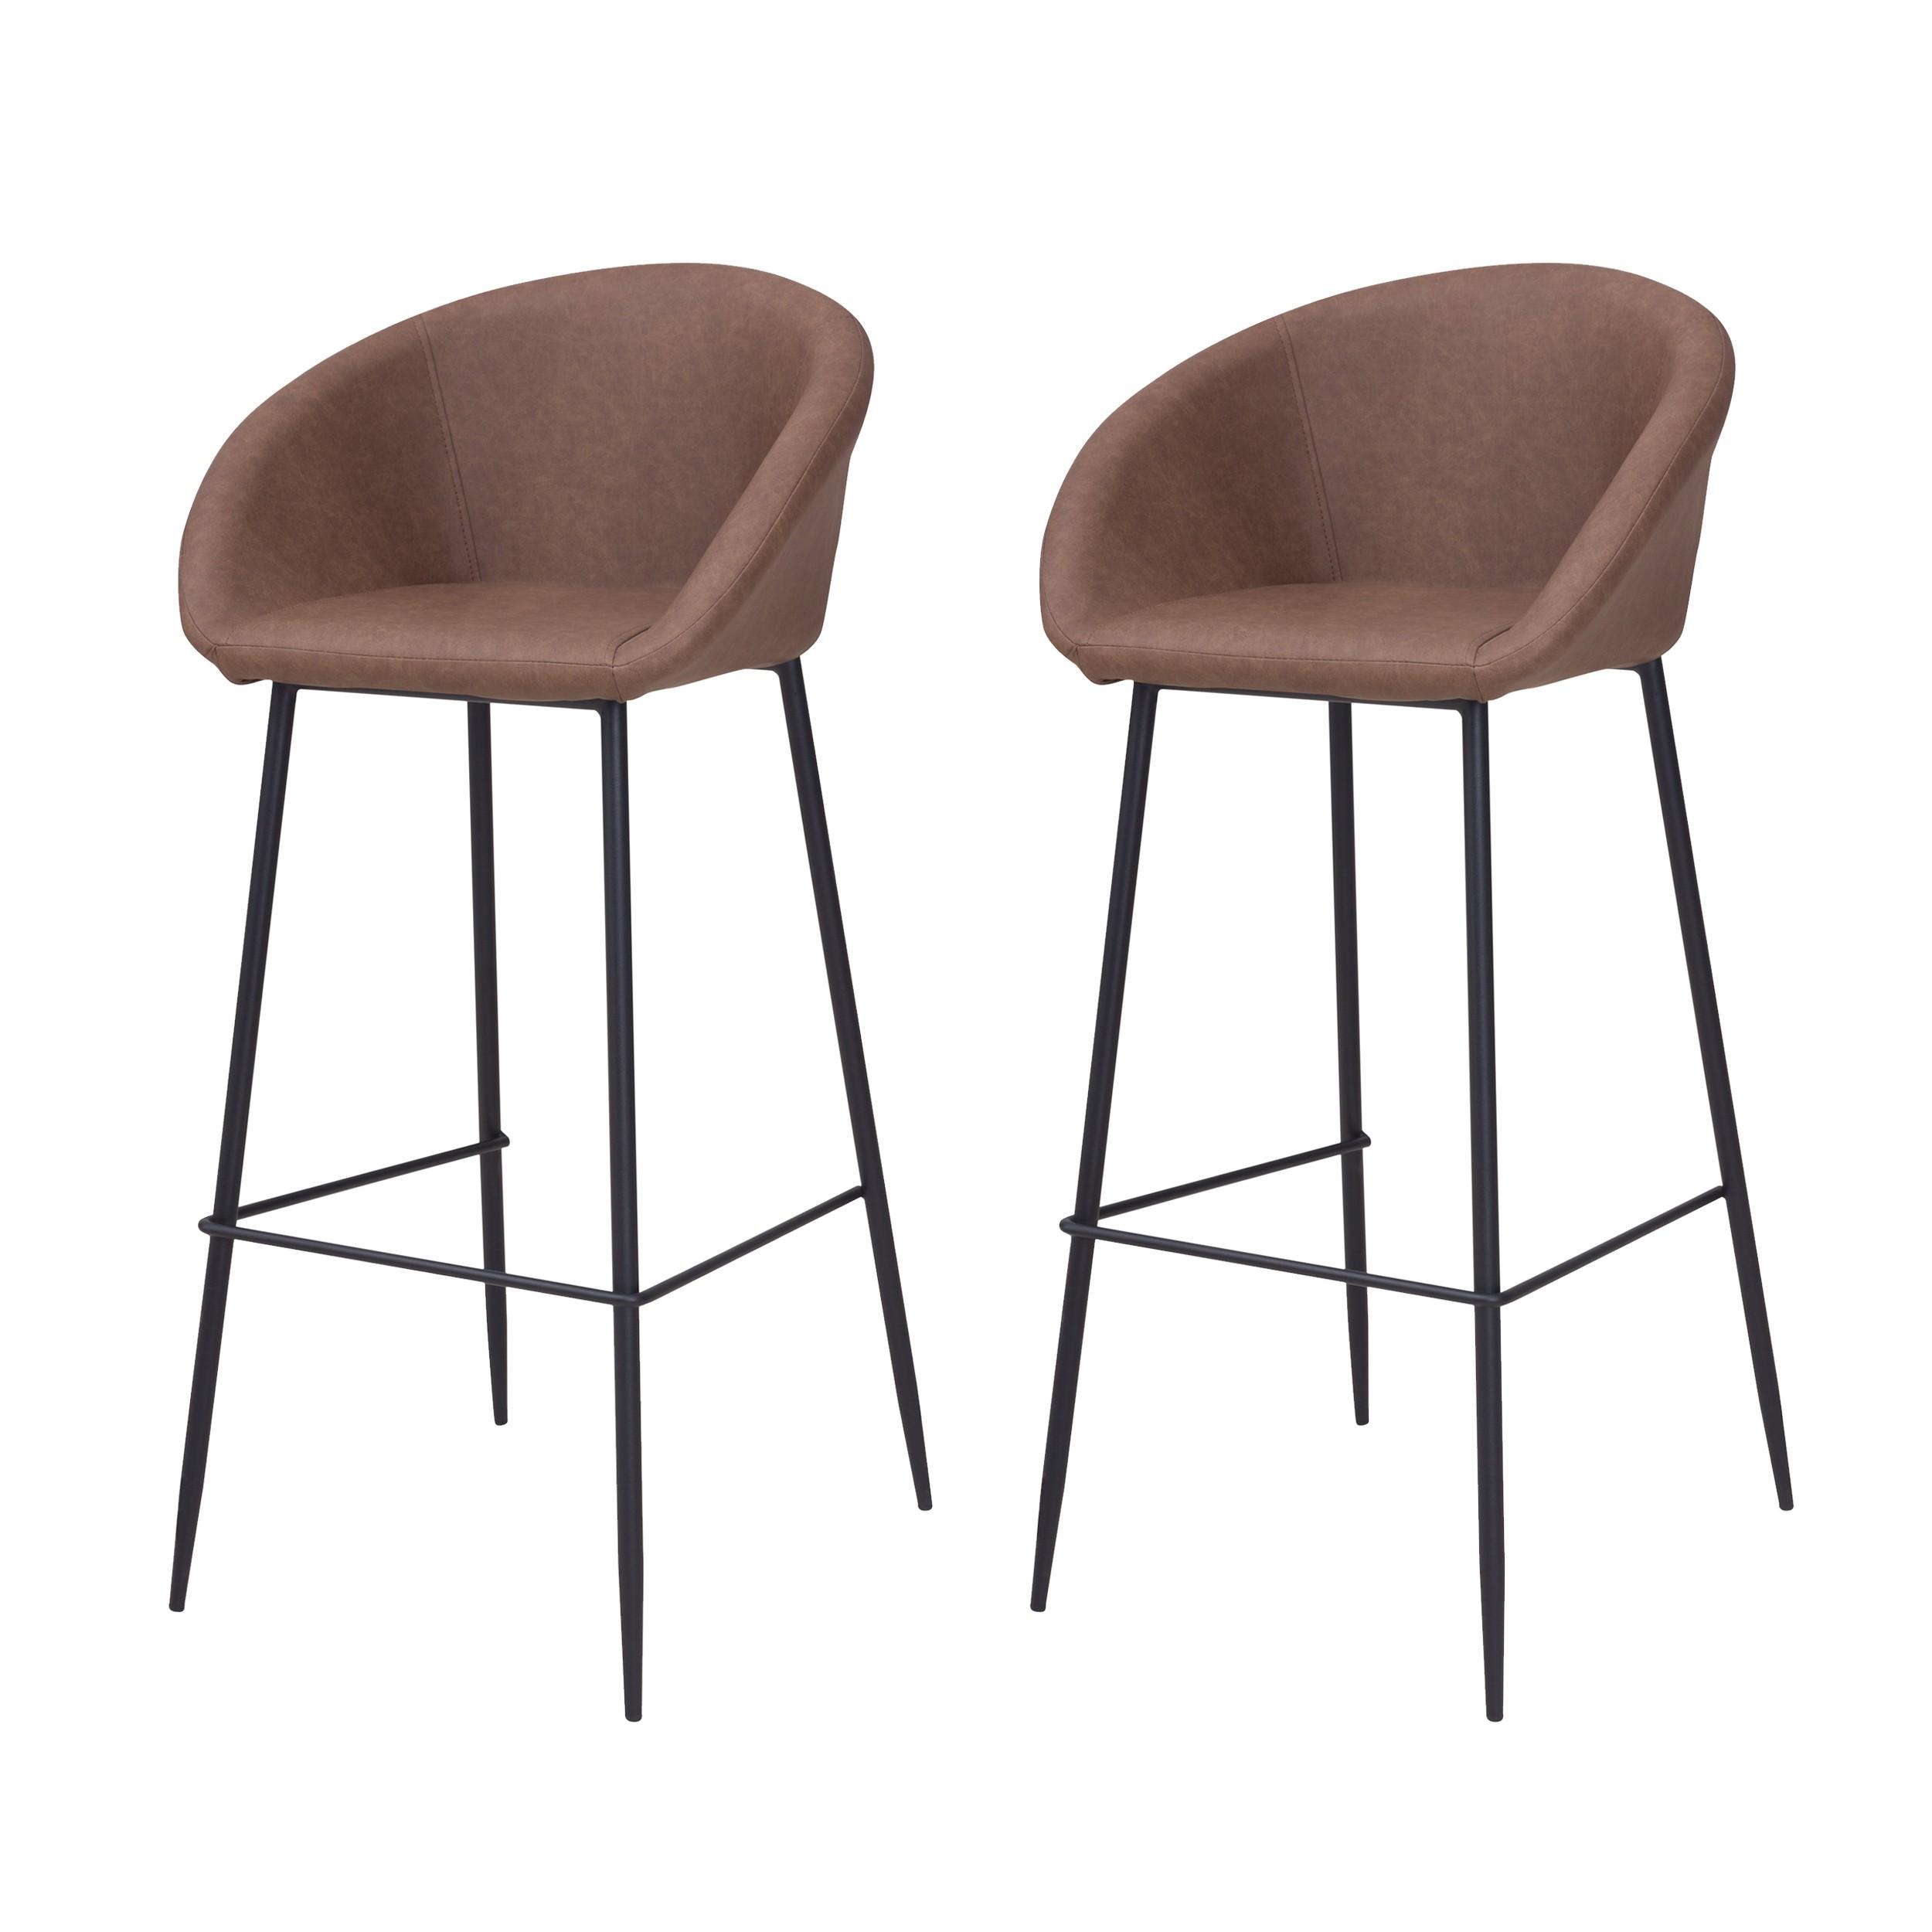 acheter chaise de bar marron chocolat